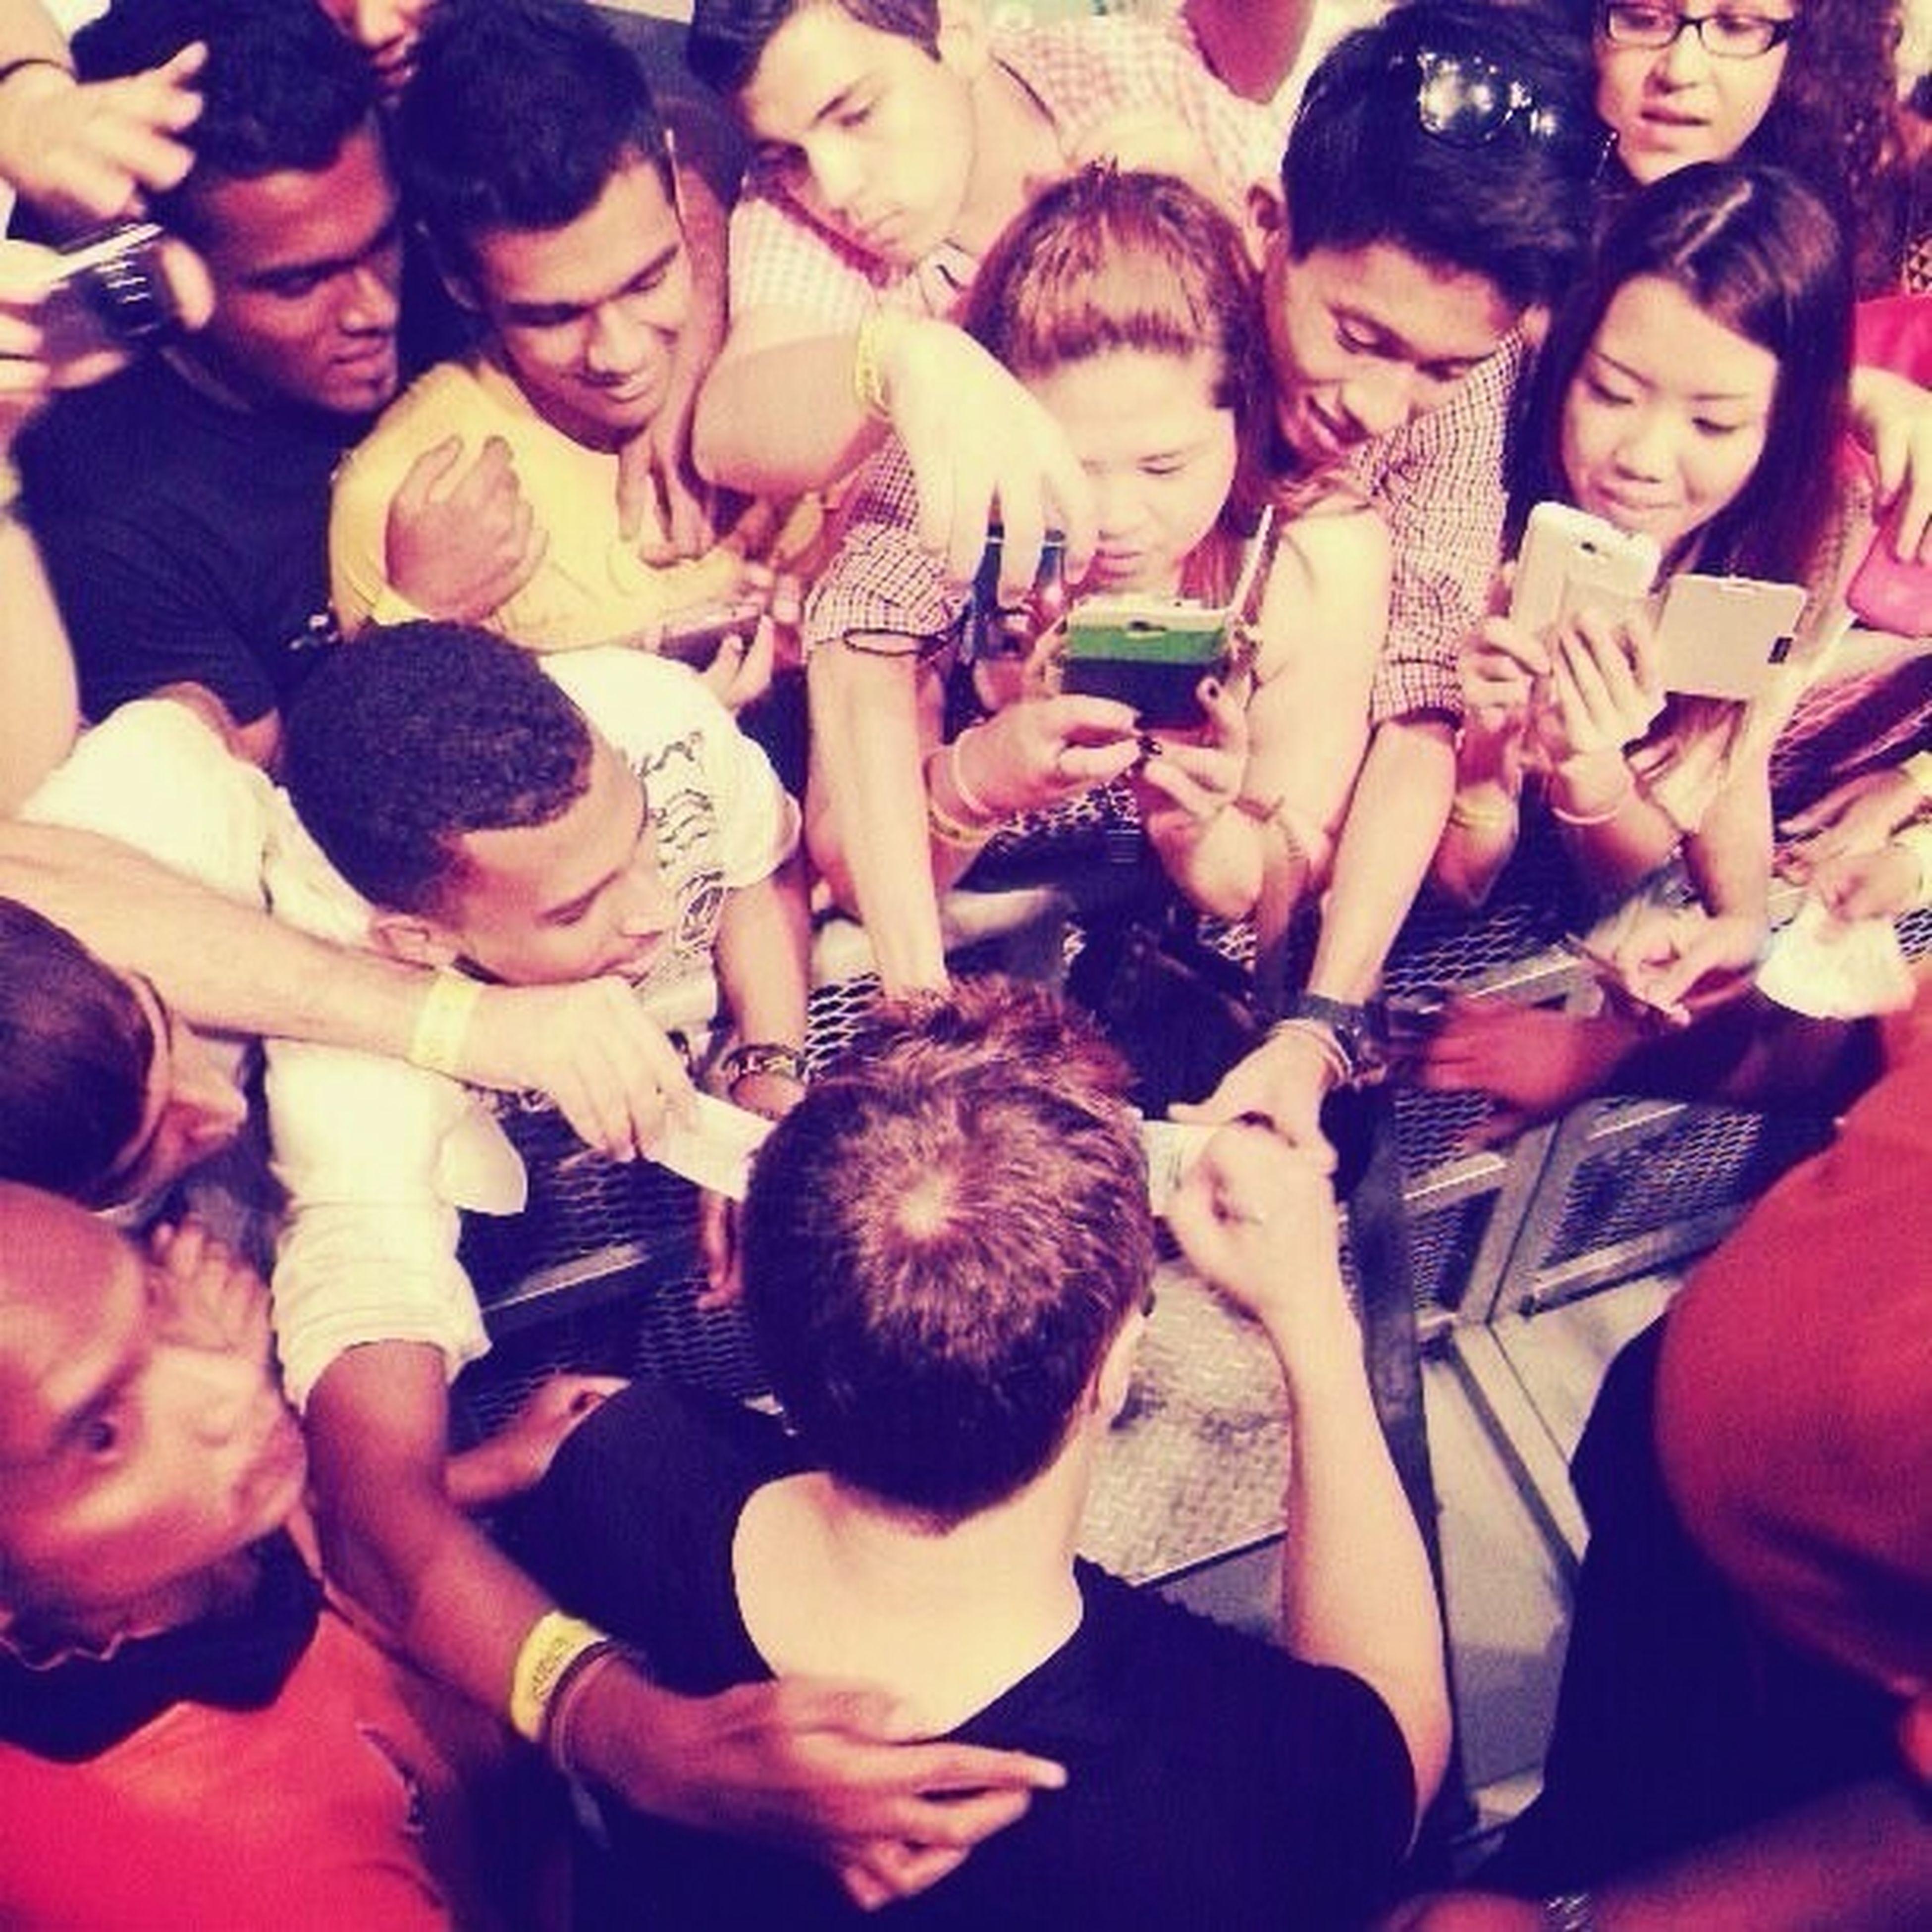 Markus schulz #throwback #party #03052013 #insane #KLlive #kualalumpur